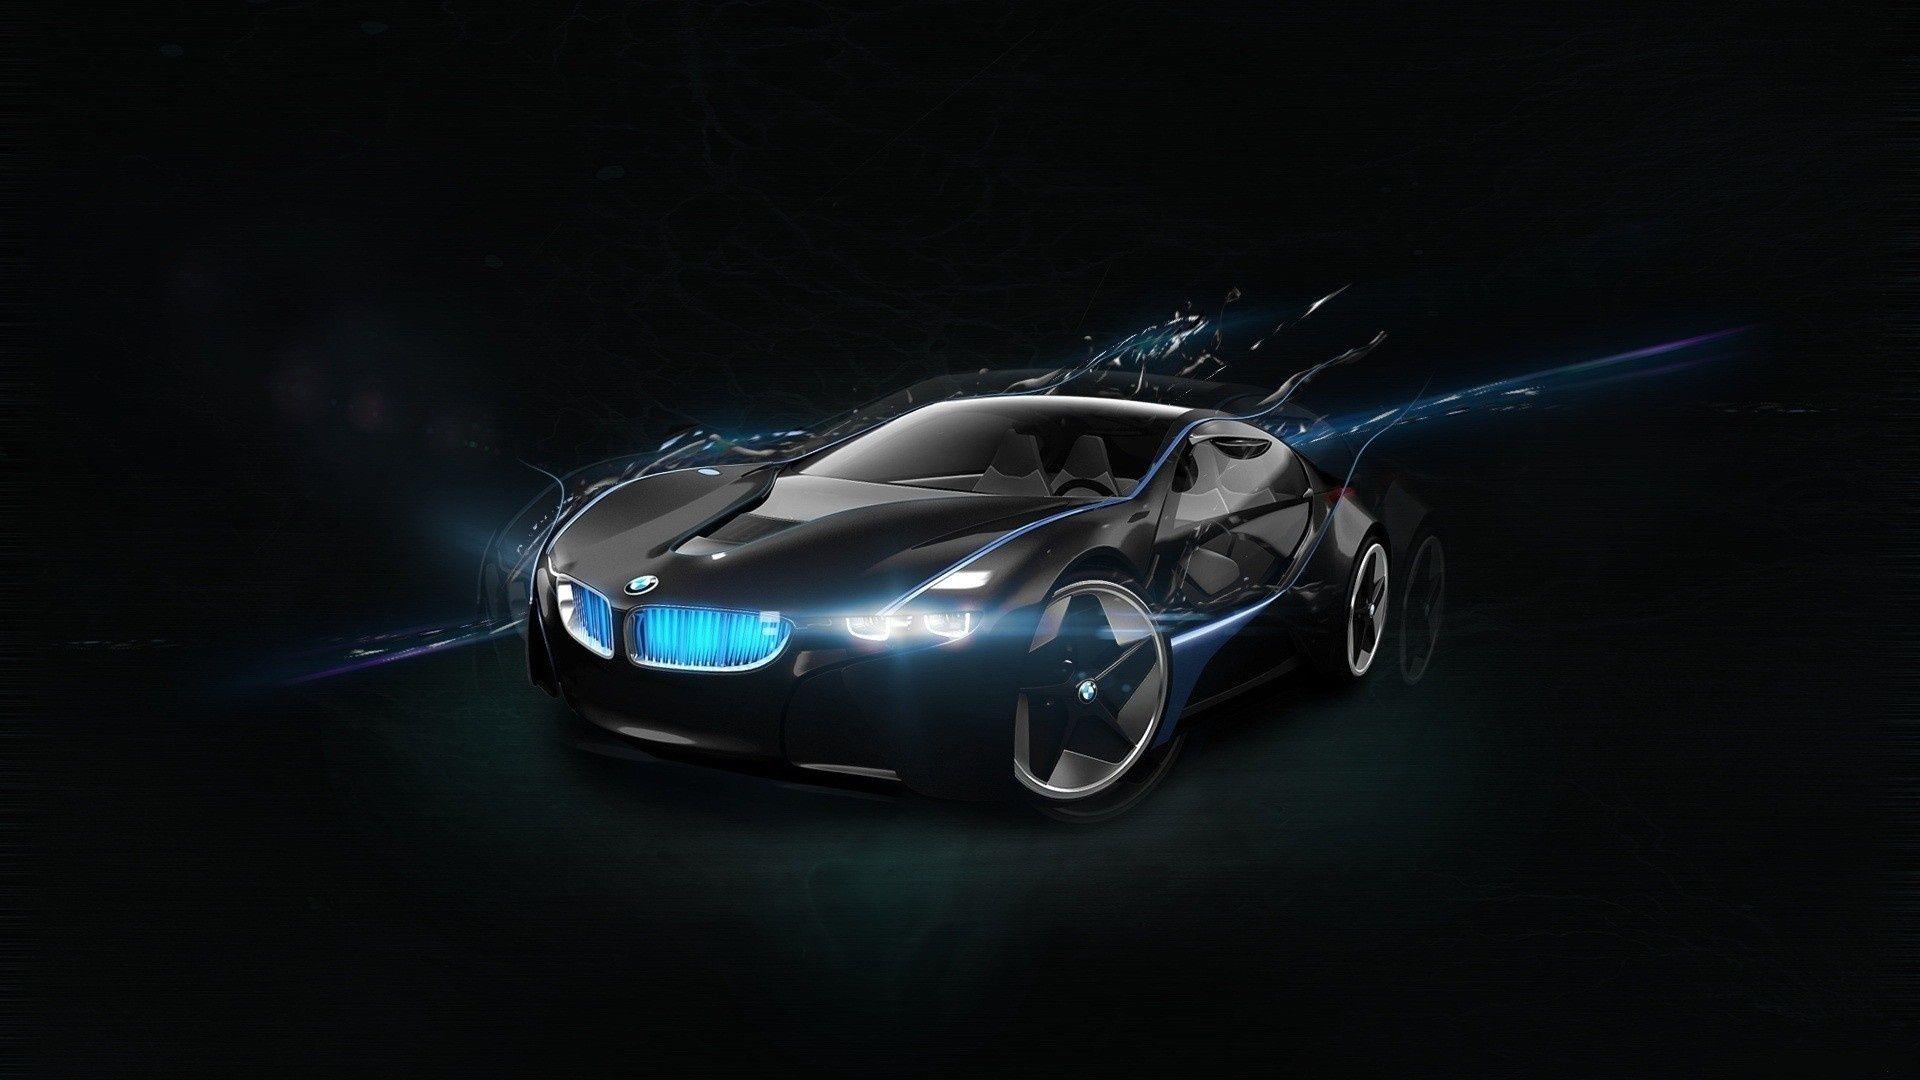 Bmw Bmw Hd Wa Super Wallpaper Hd Porsche Super Car